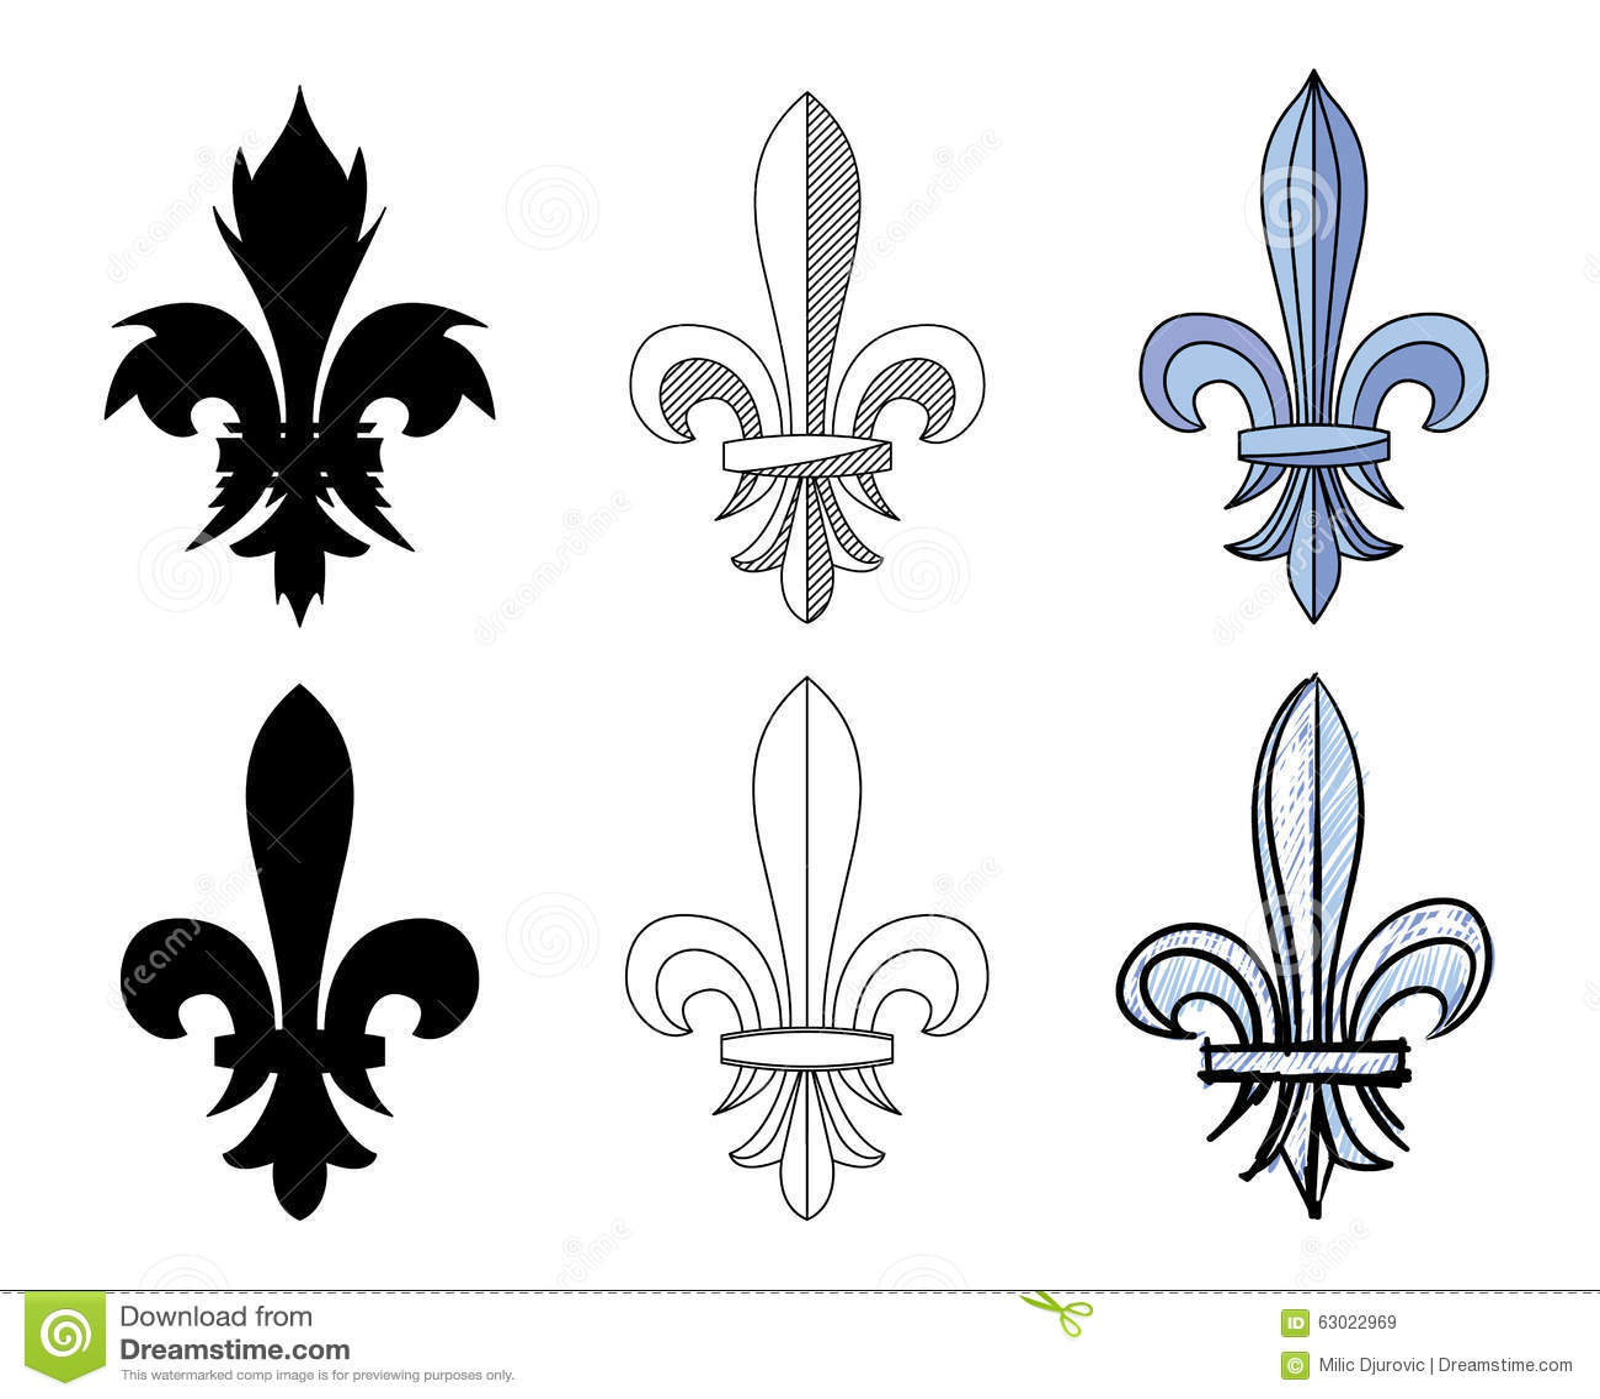 fleur de lys heraldic motif of lily flower set of different graphic presentations for design. Black Bedroom Furniture Sets. Home Design Ideas